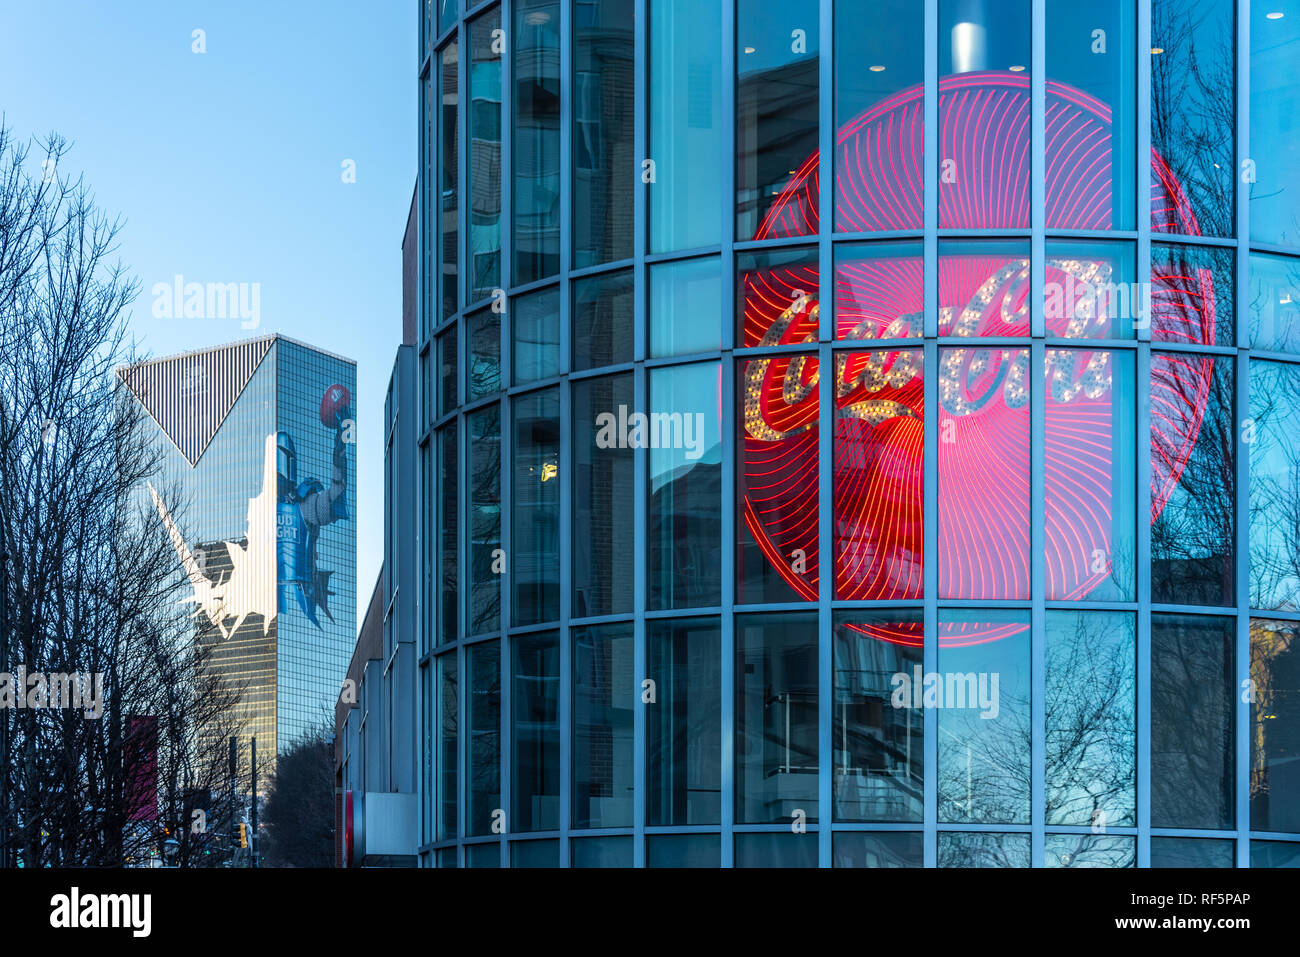 World of Coca-Cola in downtown Atlanta, Georgia, adjoining Centennial Olympic Park. (USA) - Stock Image